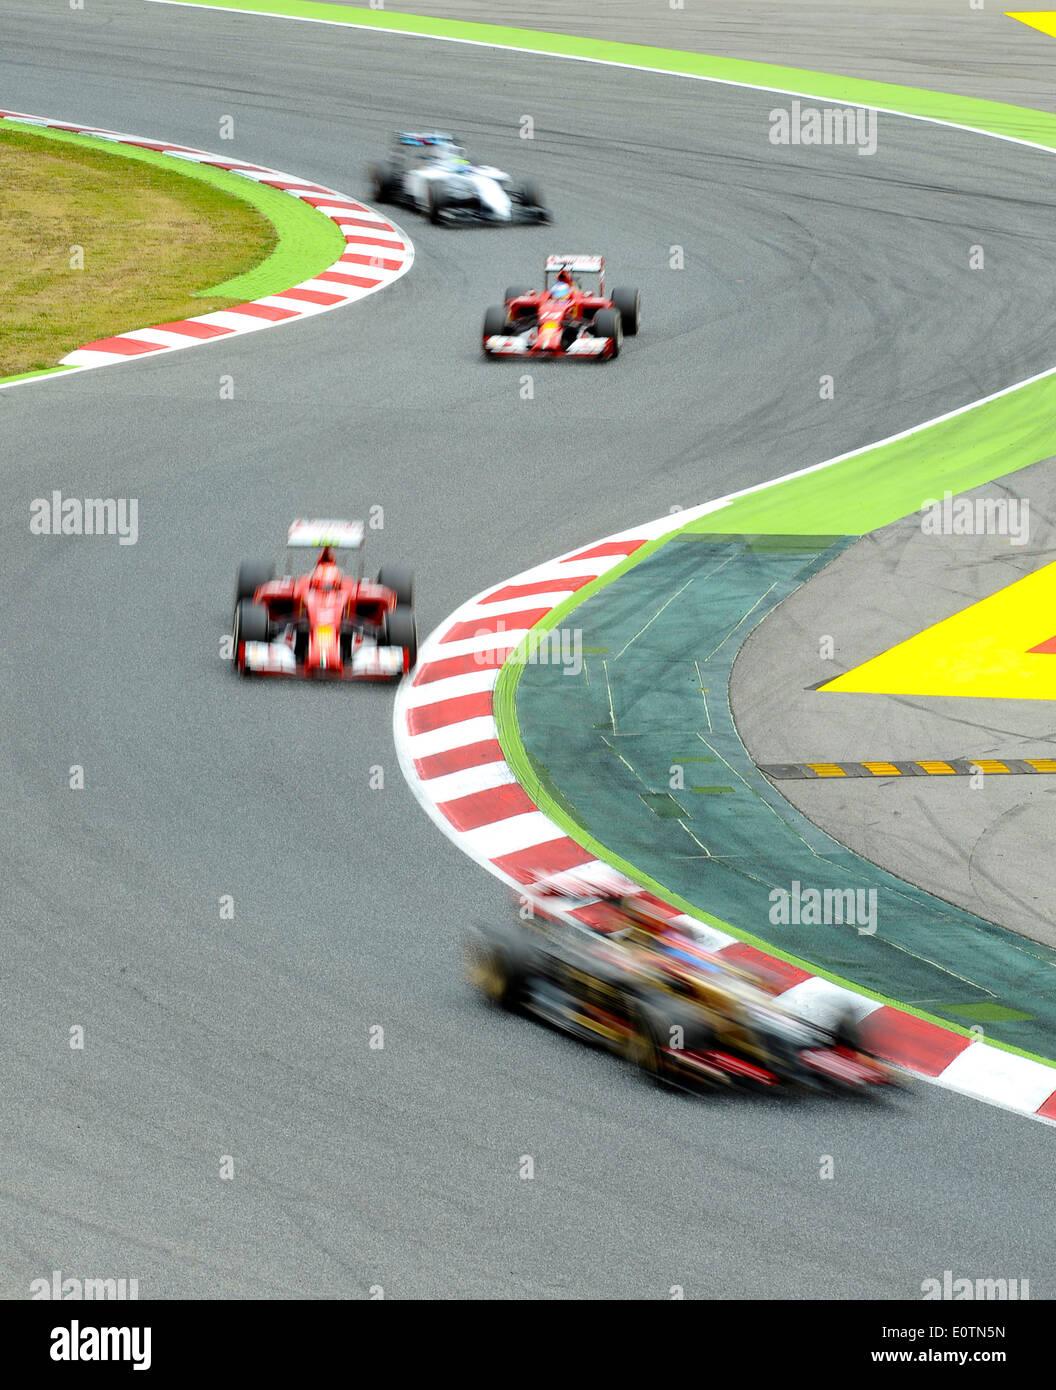 Motorsport-9. bis 11. kann 2014, Circuit de Catalunya, Barcelona, Spanien, zielstrebiger Grand Prix von Spanien Stockbild